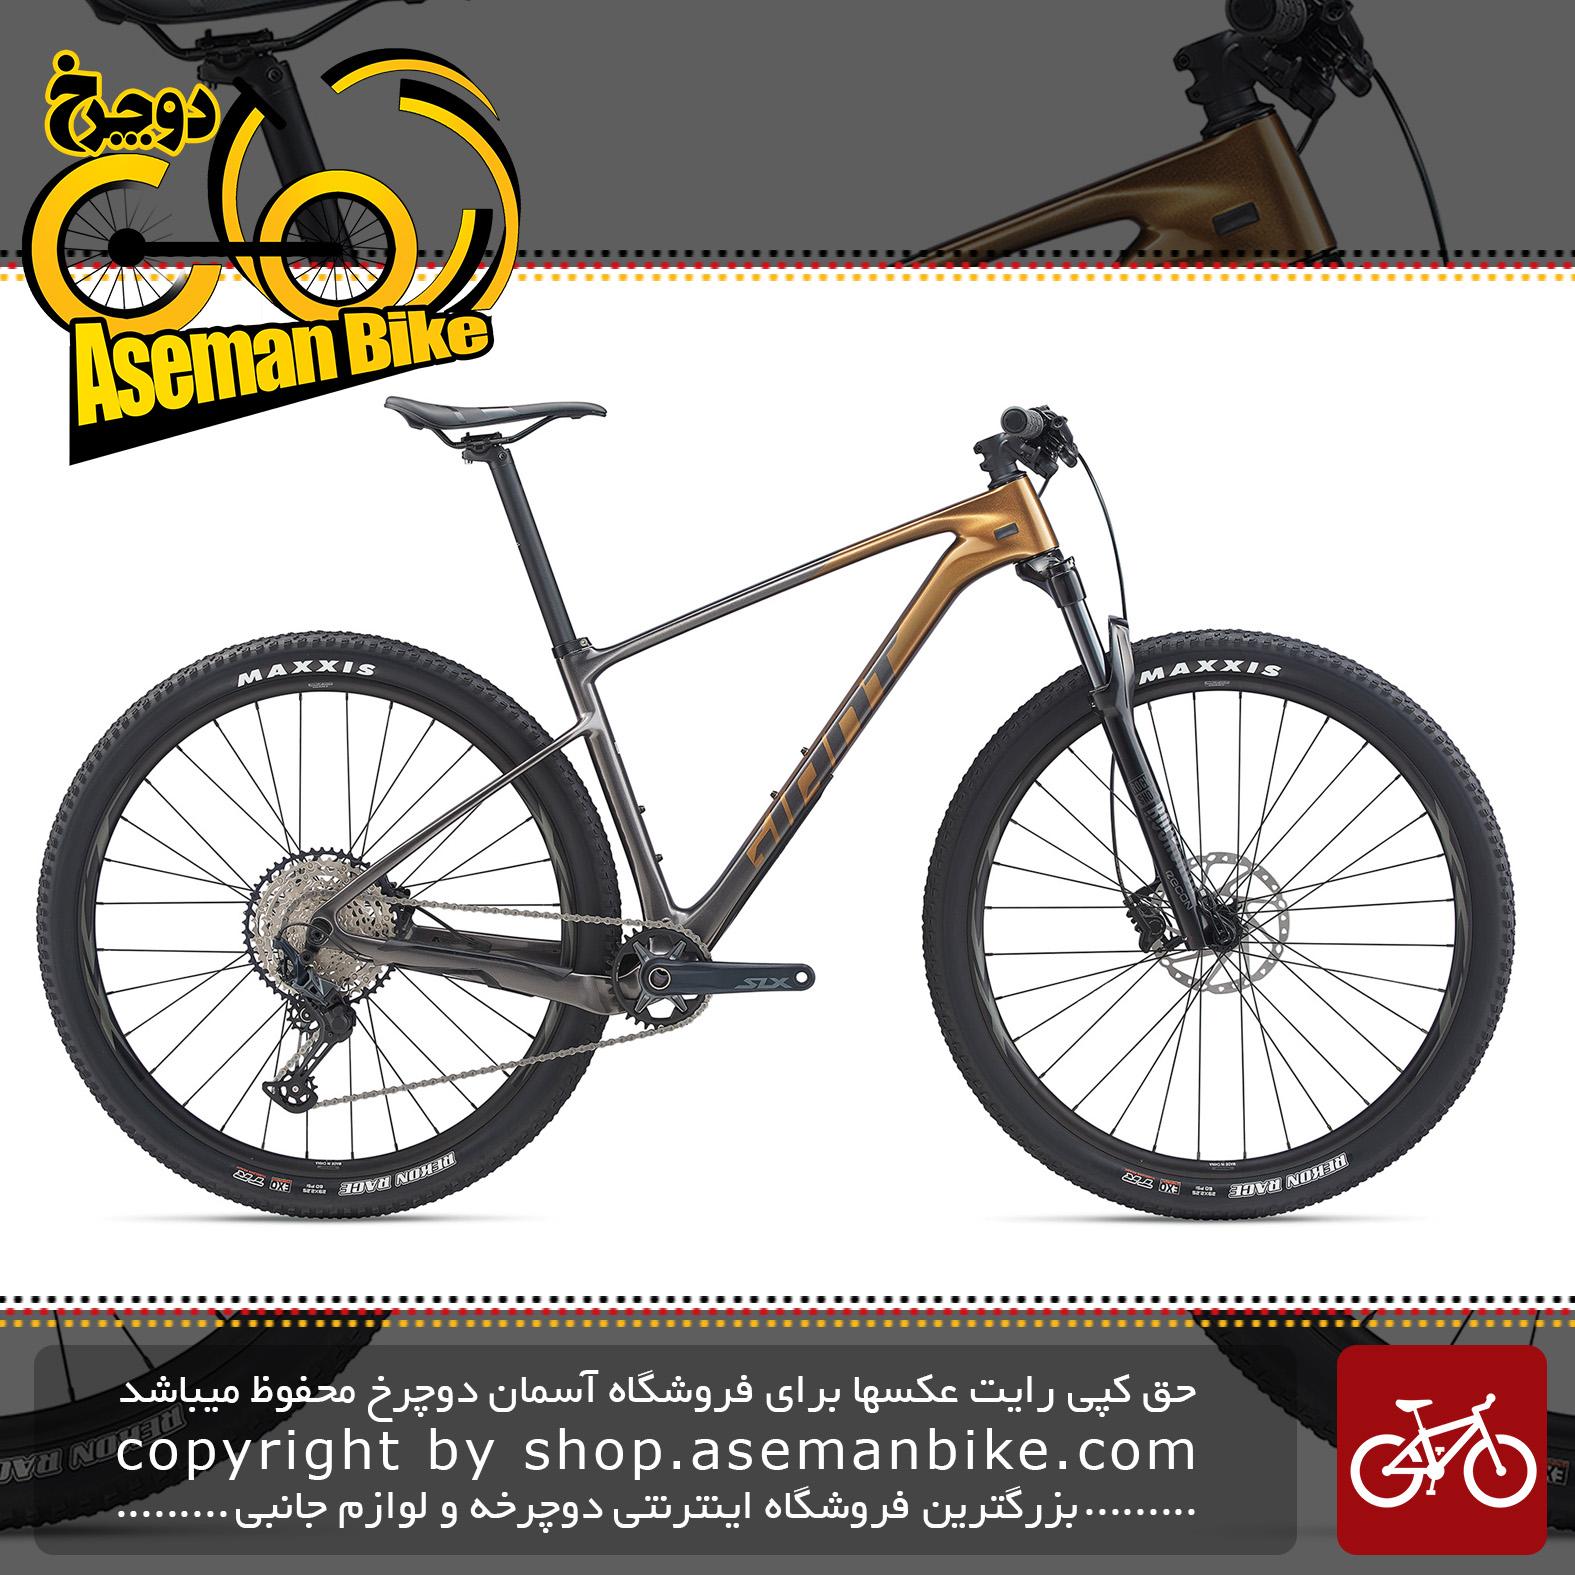 دوچرخه کوهستان جاینت مدل ایکس تی سی ادونس 29 اینچ 2 2020 Giant Mountain Bicycle XTC Advanced 29 2 2020